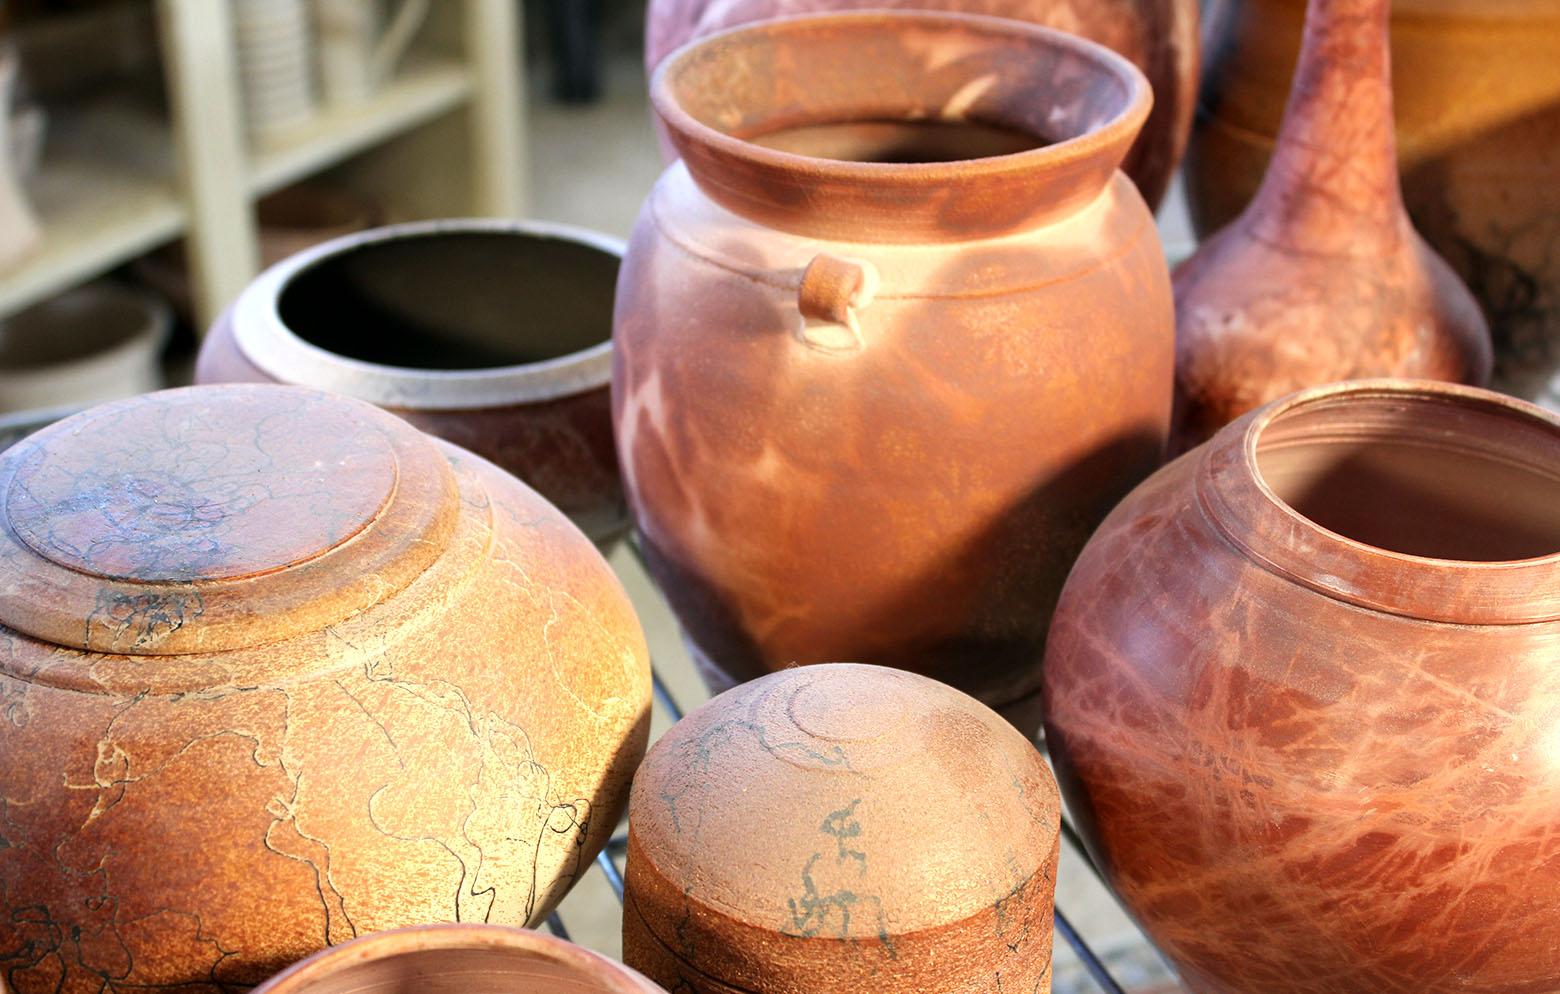 22nd-street-clay_pots.jpg